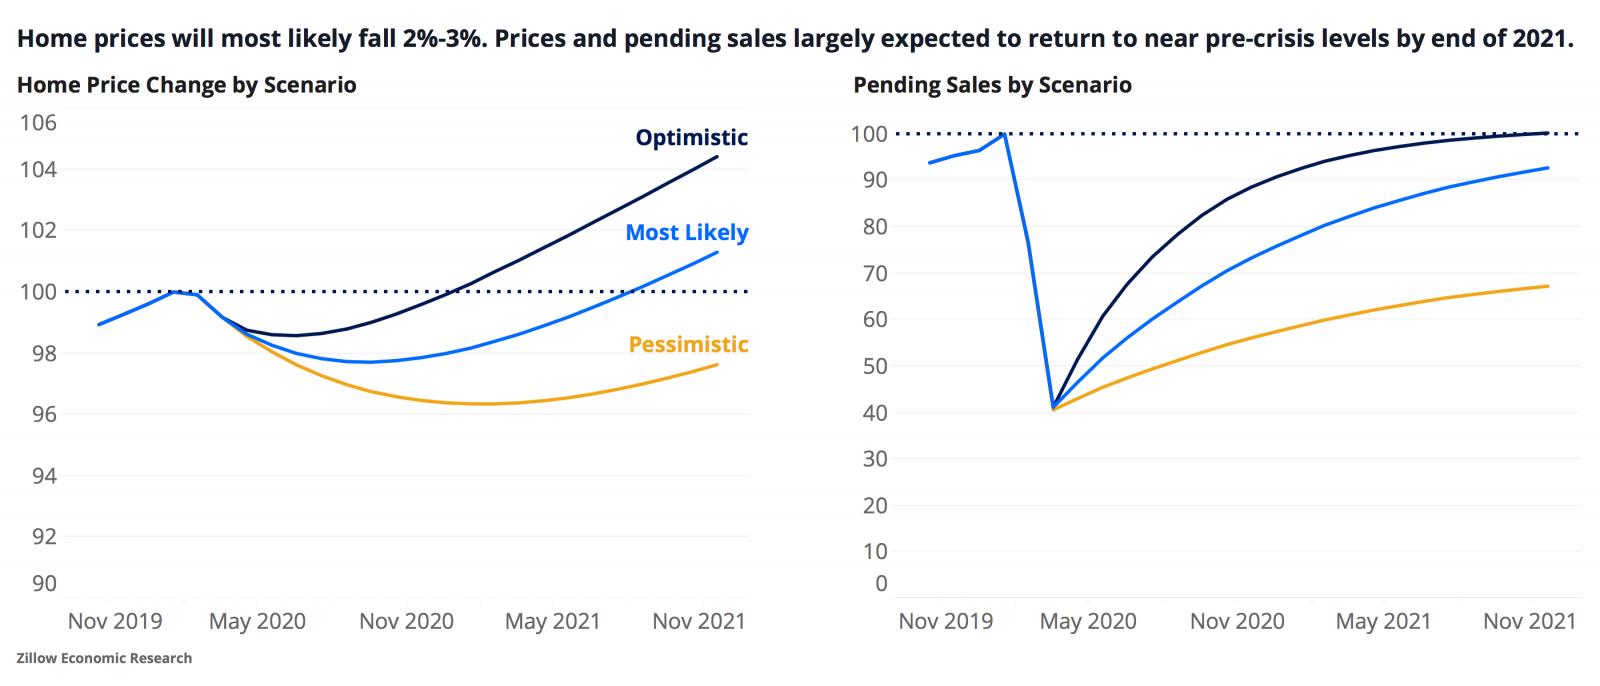 Zillow's Housing Market Predictions 2021